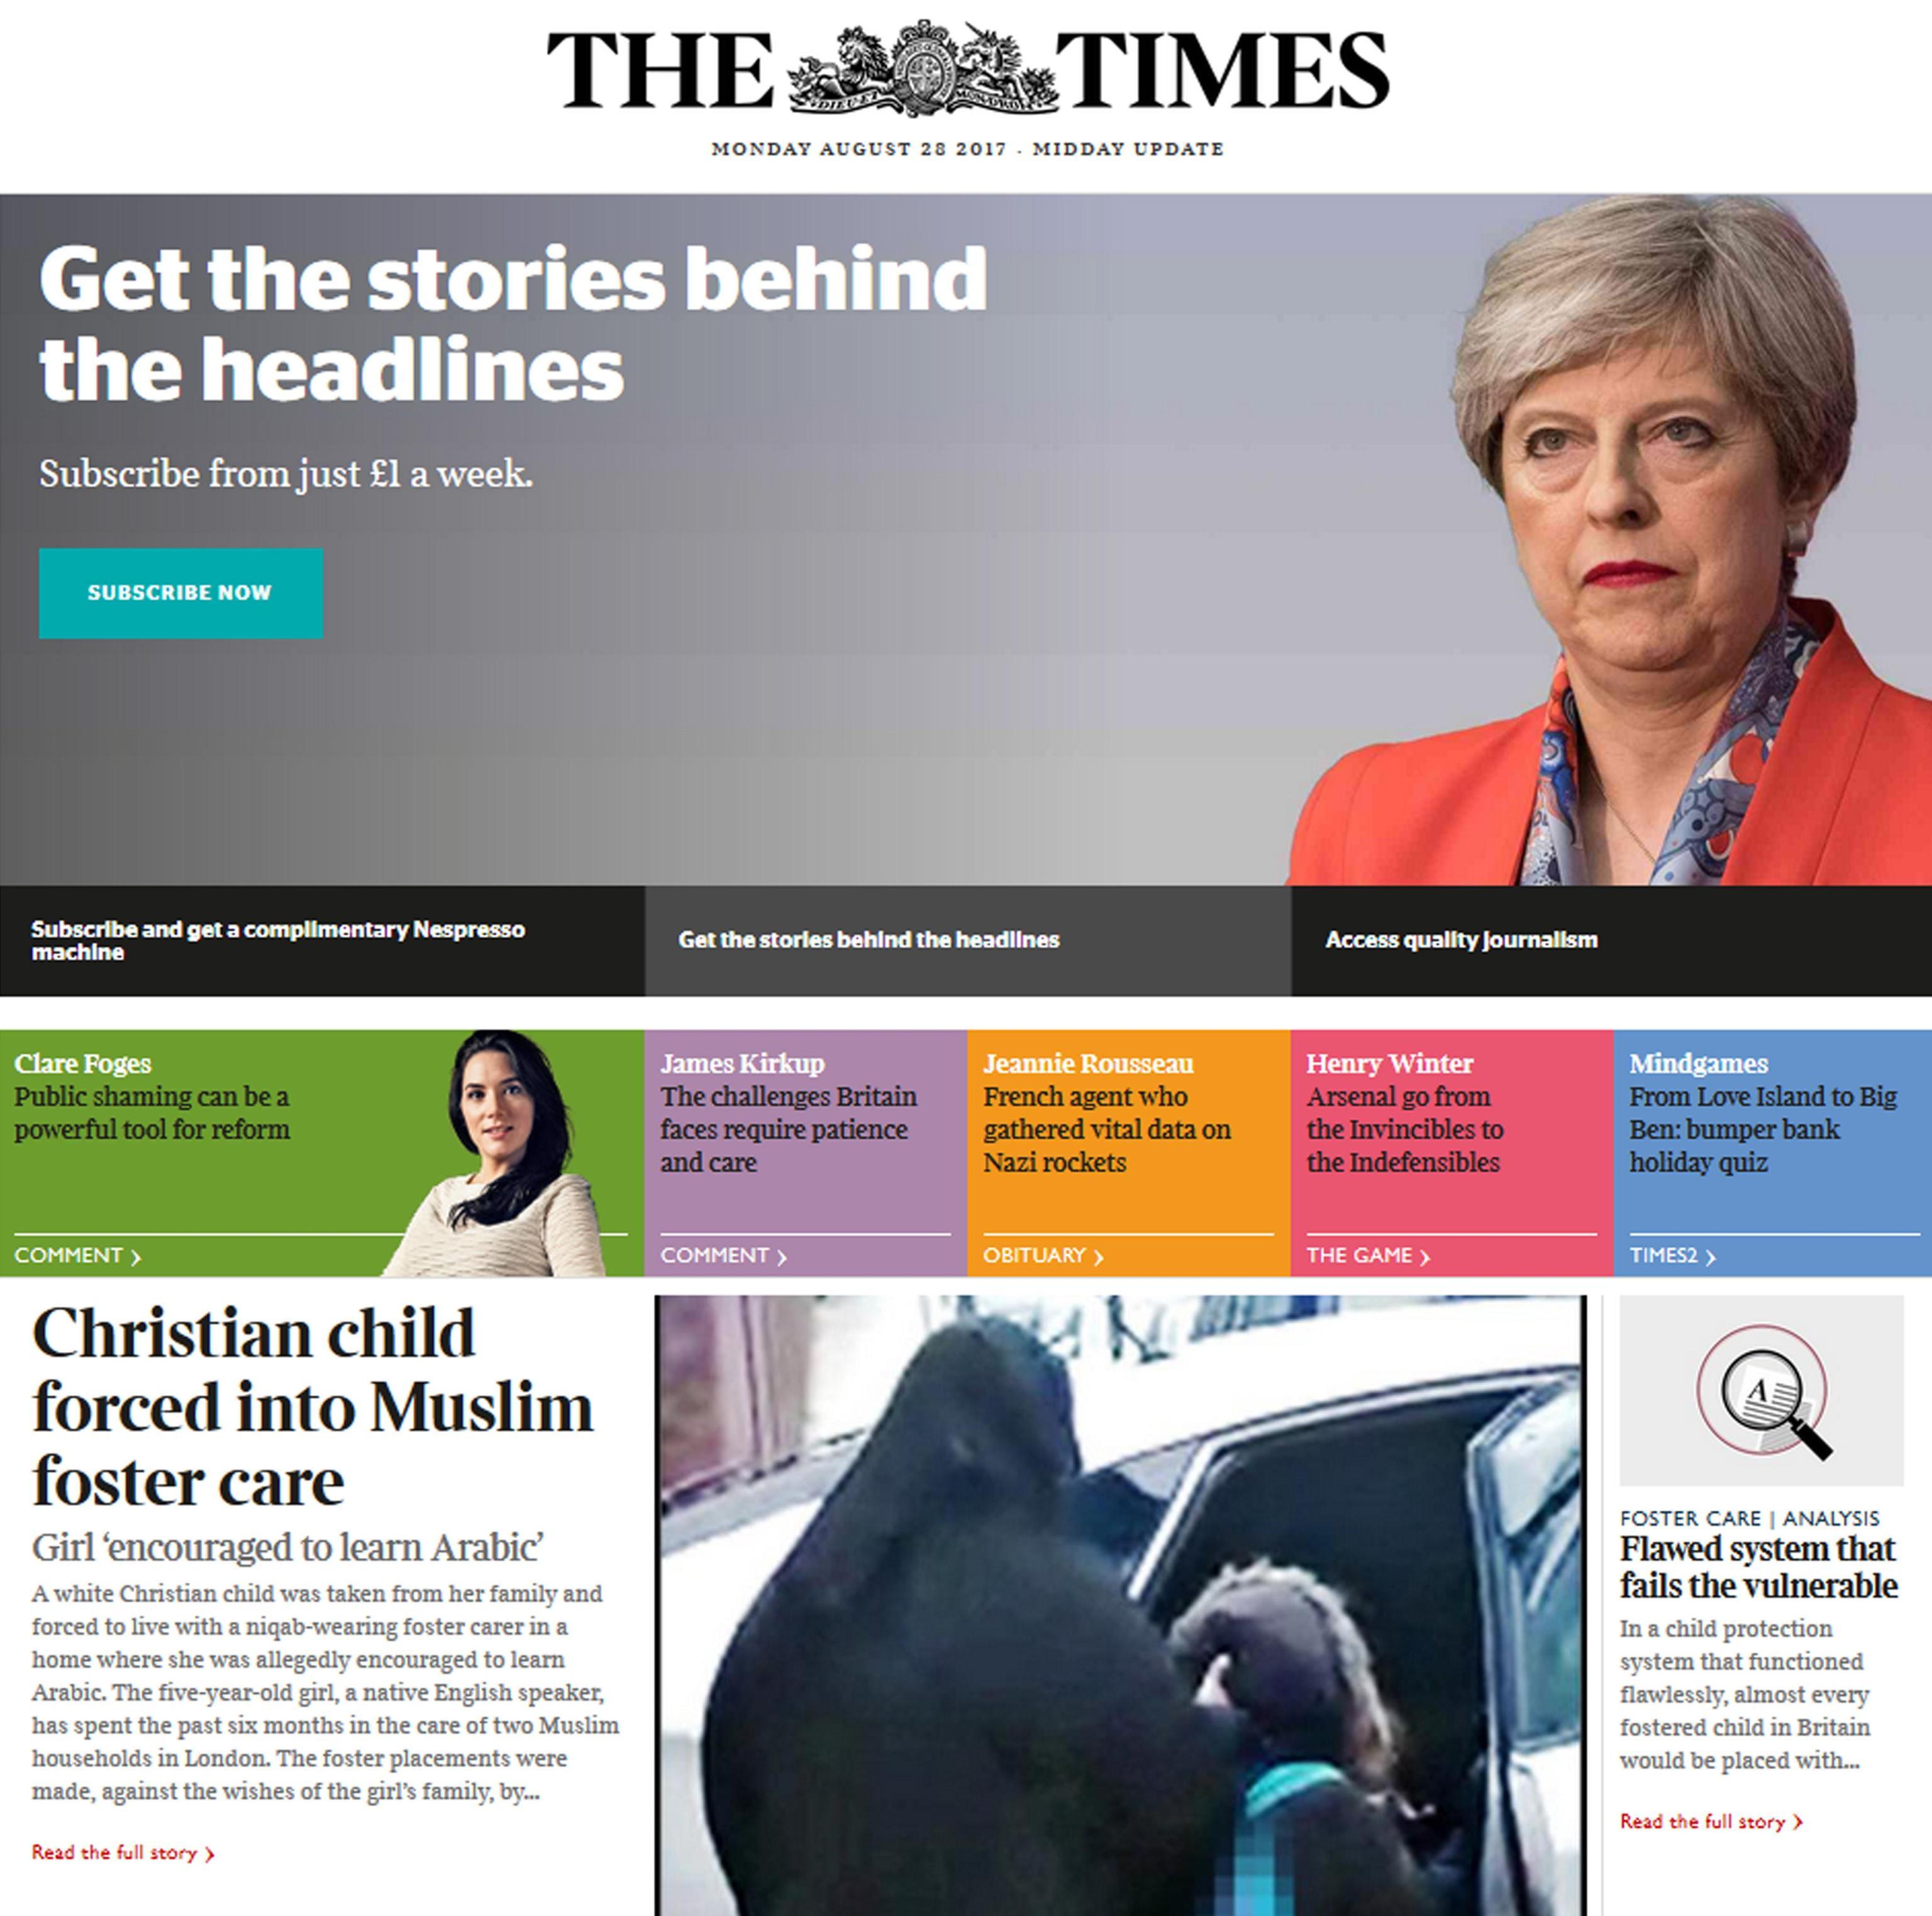 Bimba cristiana in affido a musulmani, polemica in Gb